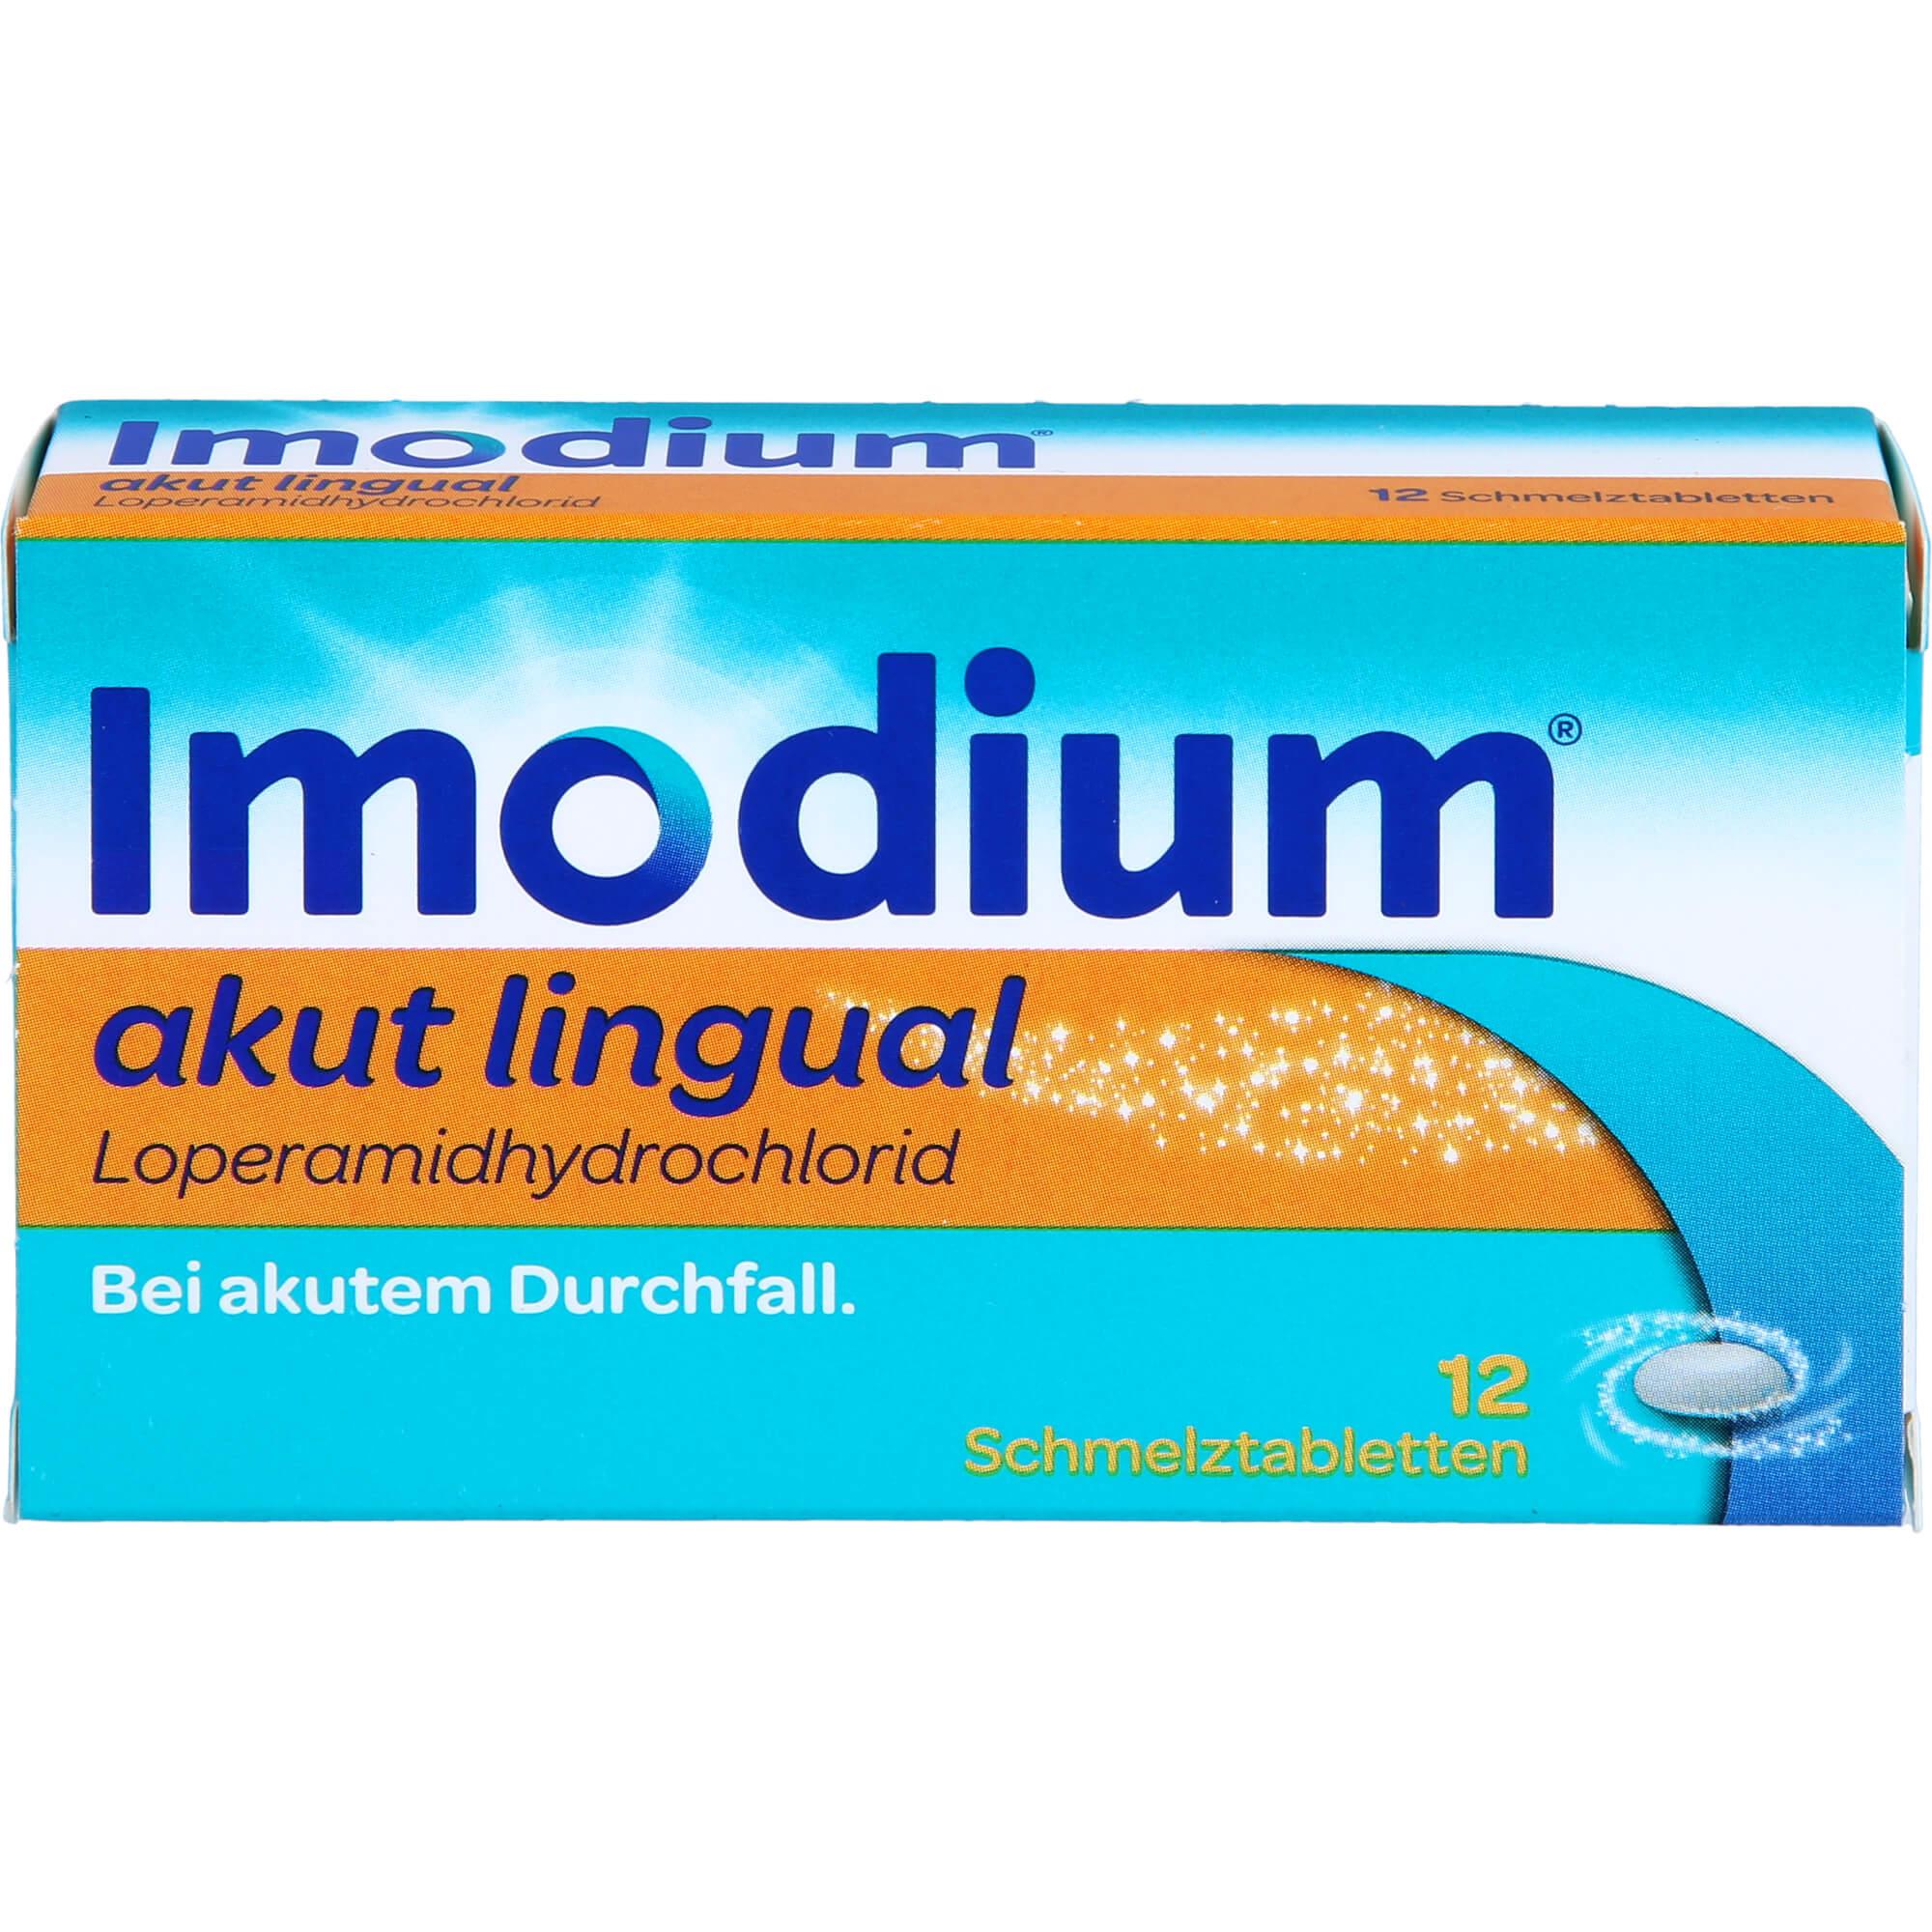 IMODIUM-akut-lingual-Schmelztabletten